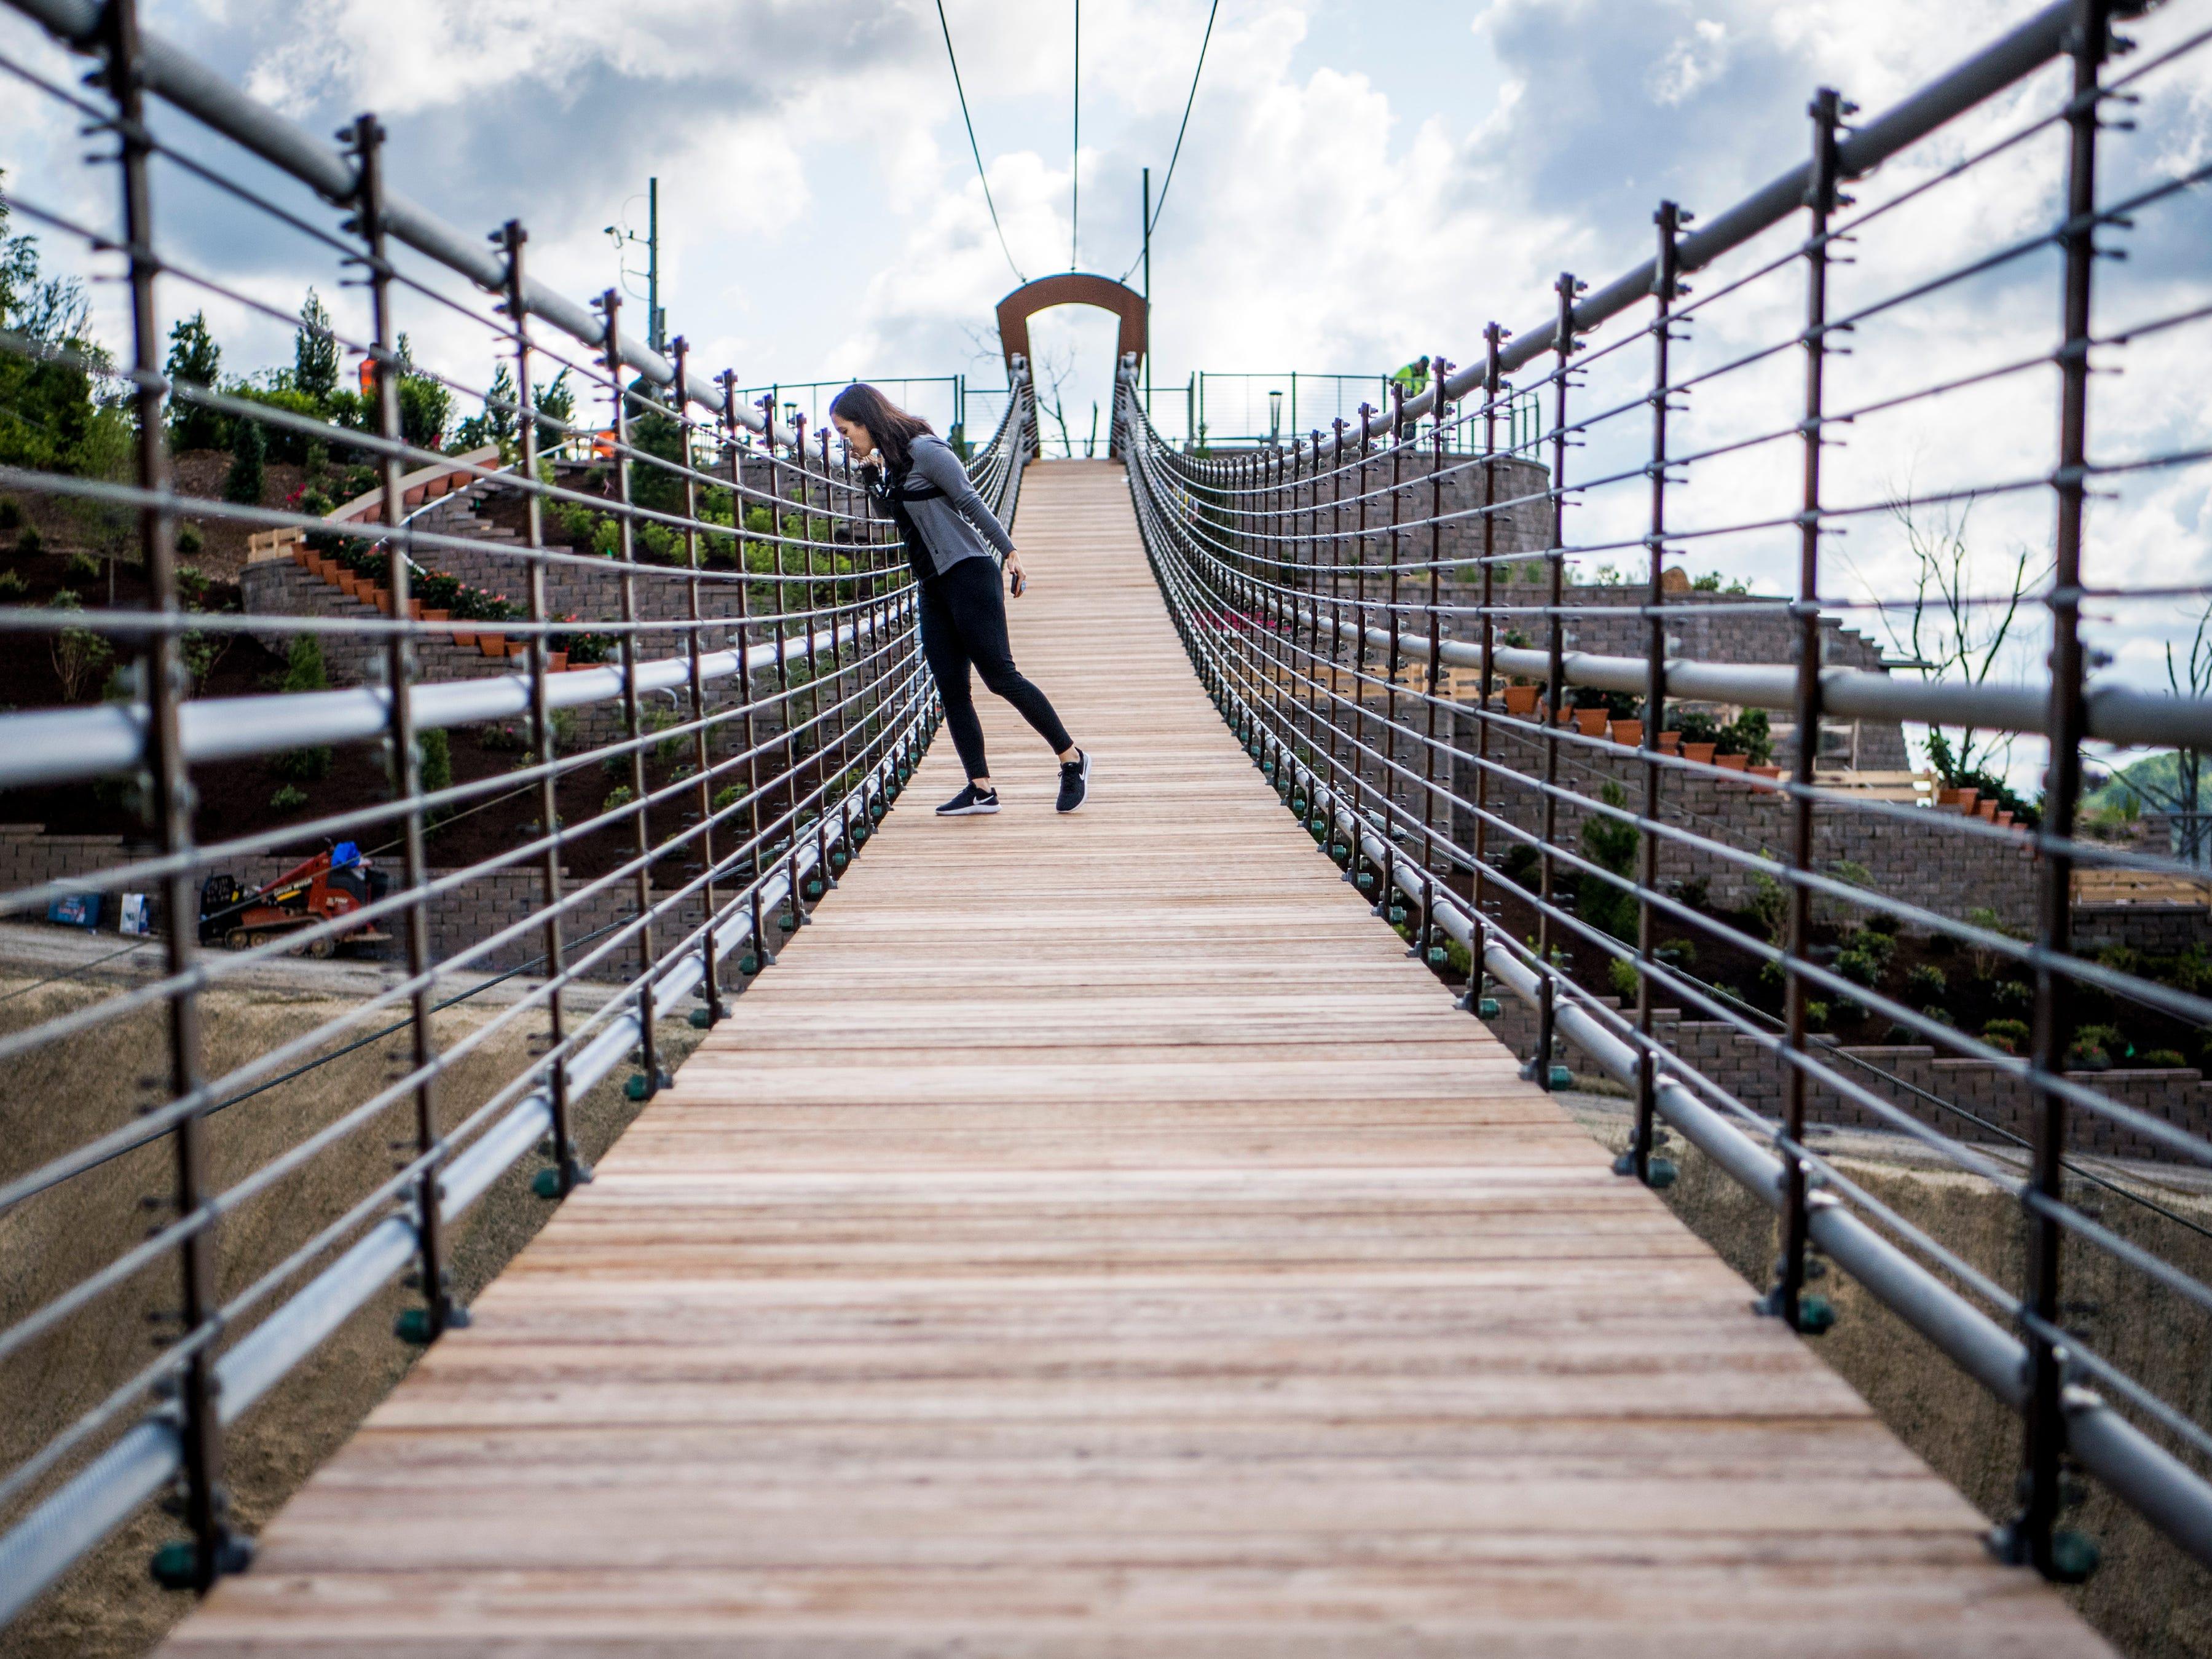 Knoxville News Sentinel reporter Brenna Mcdermott peers over the side of the Gatlinburg SkyBridge, North America's longest pedestrian suspension bridge, on Tuesday, May 14, 2019.